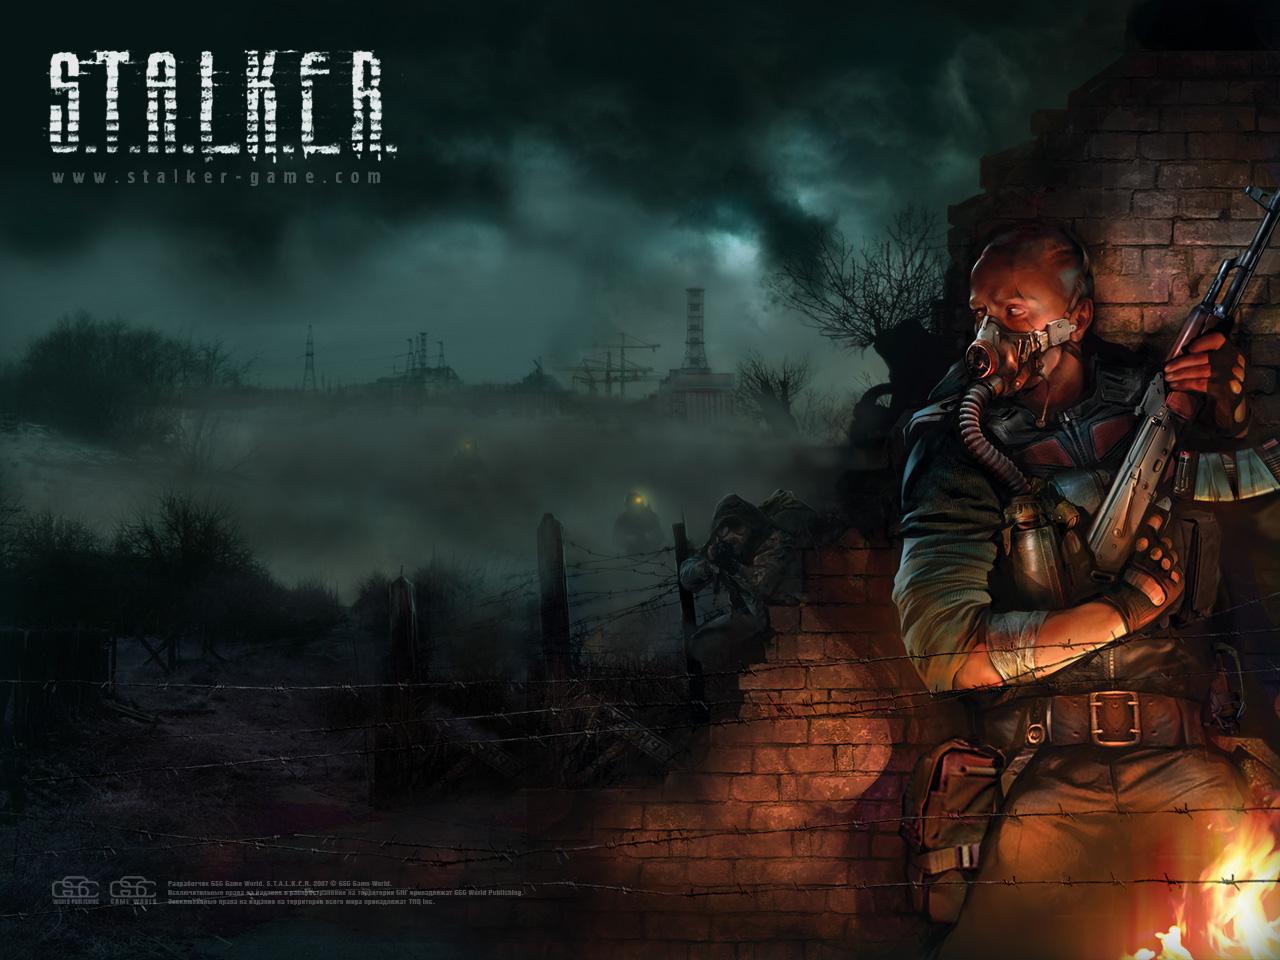 S.T.A.L.K.E.R Stalker_wp_02_1280